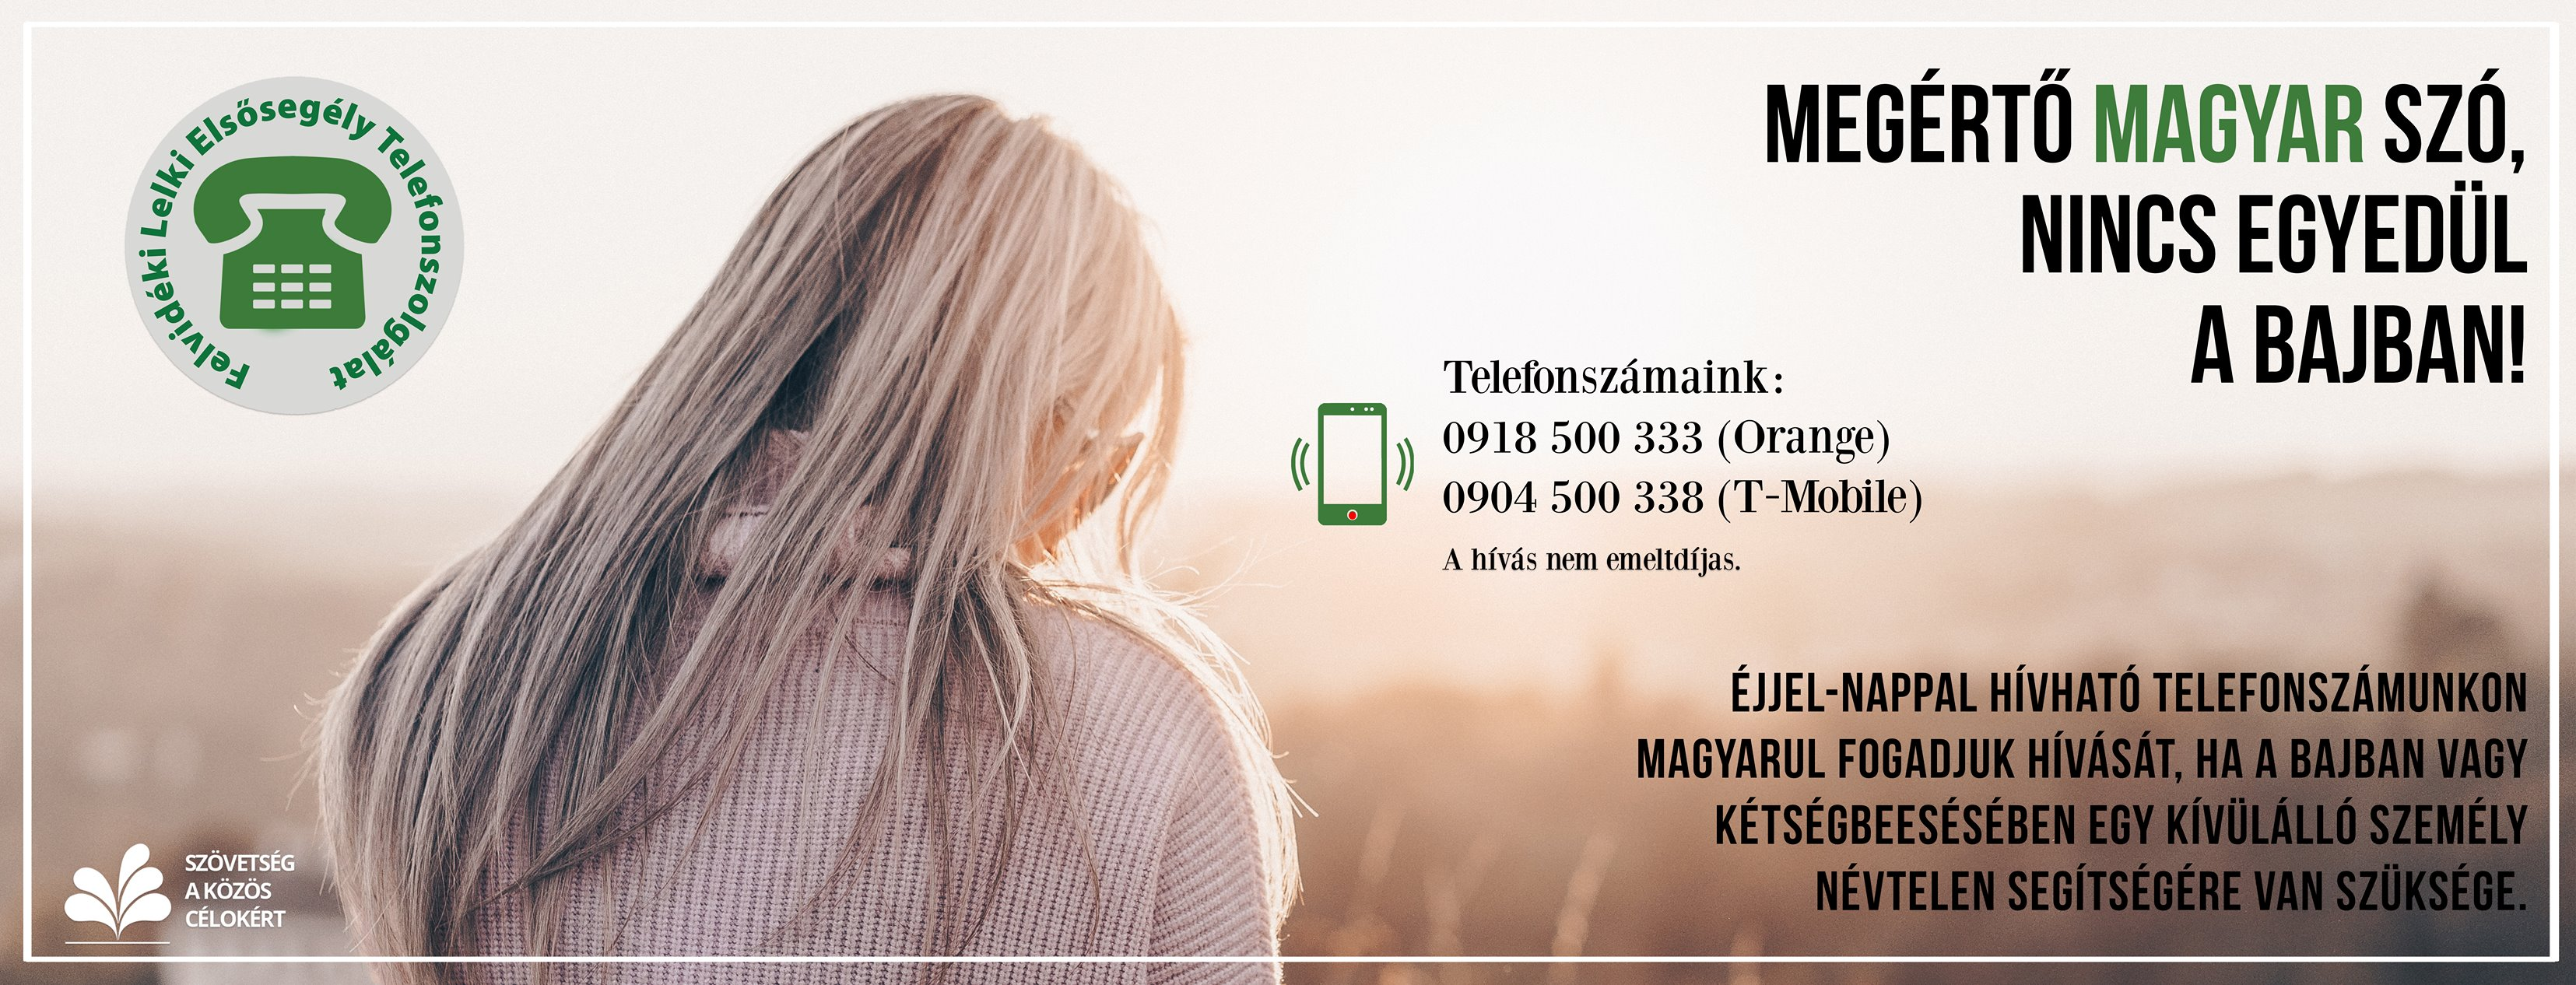 53397792_2264465993876494_6420412418832203776_o